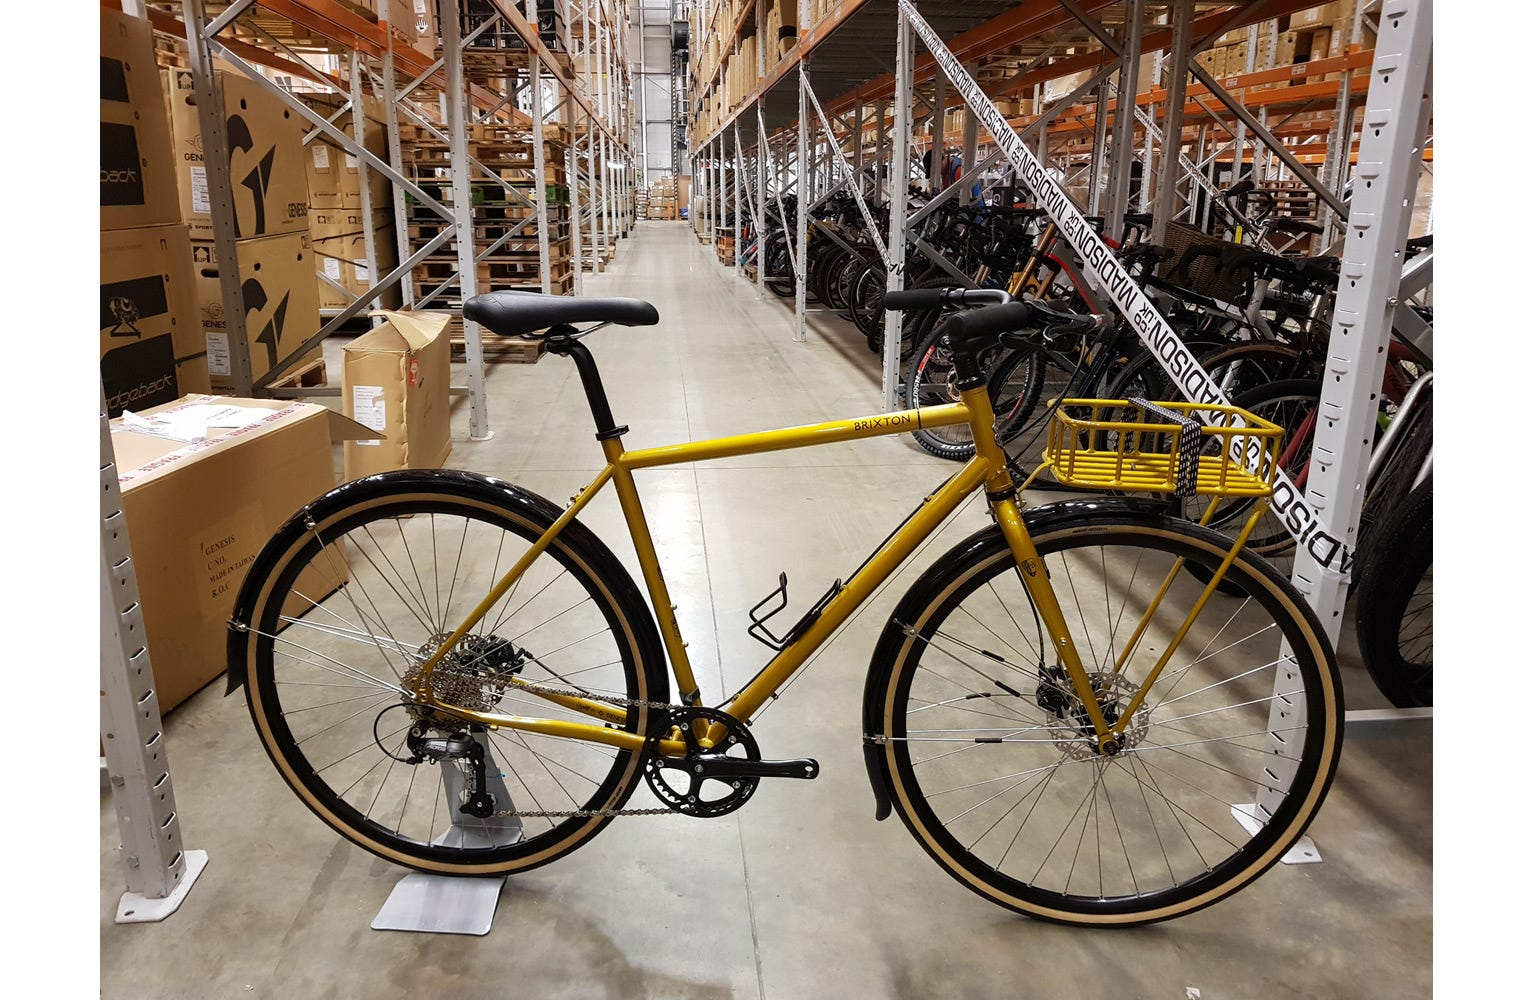 Genesis 2018 Brixton MD Bike sample (used)